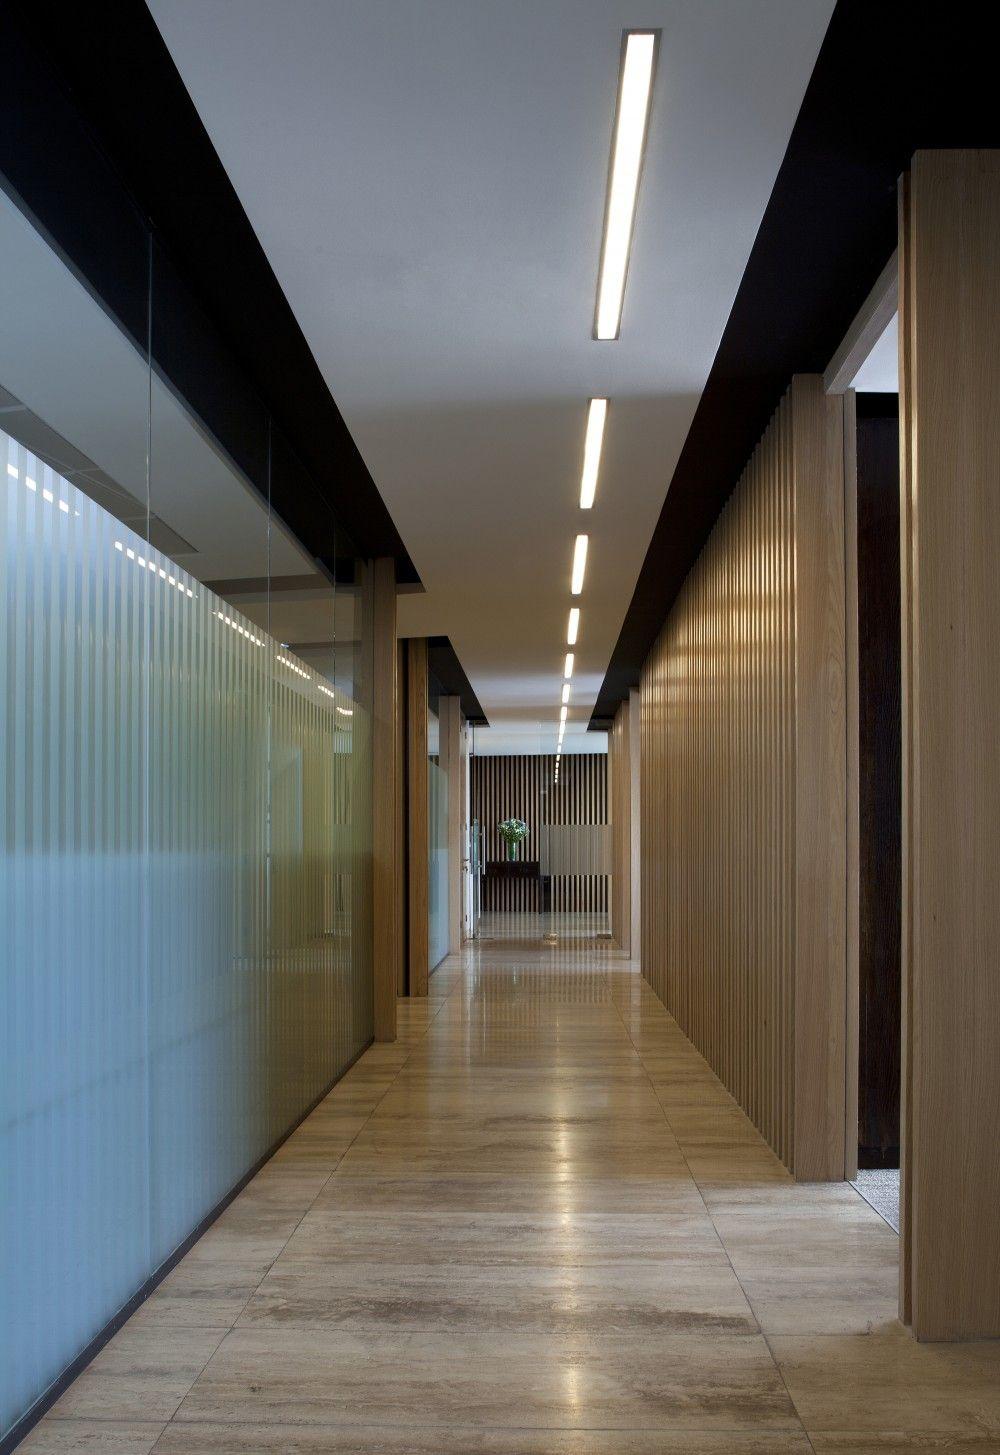 Offices porzio claro westendarp architects natalia vial office interior design office interiors